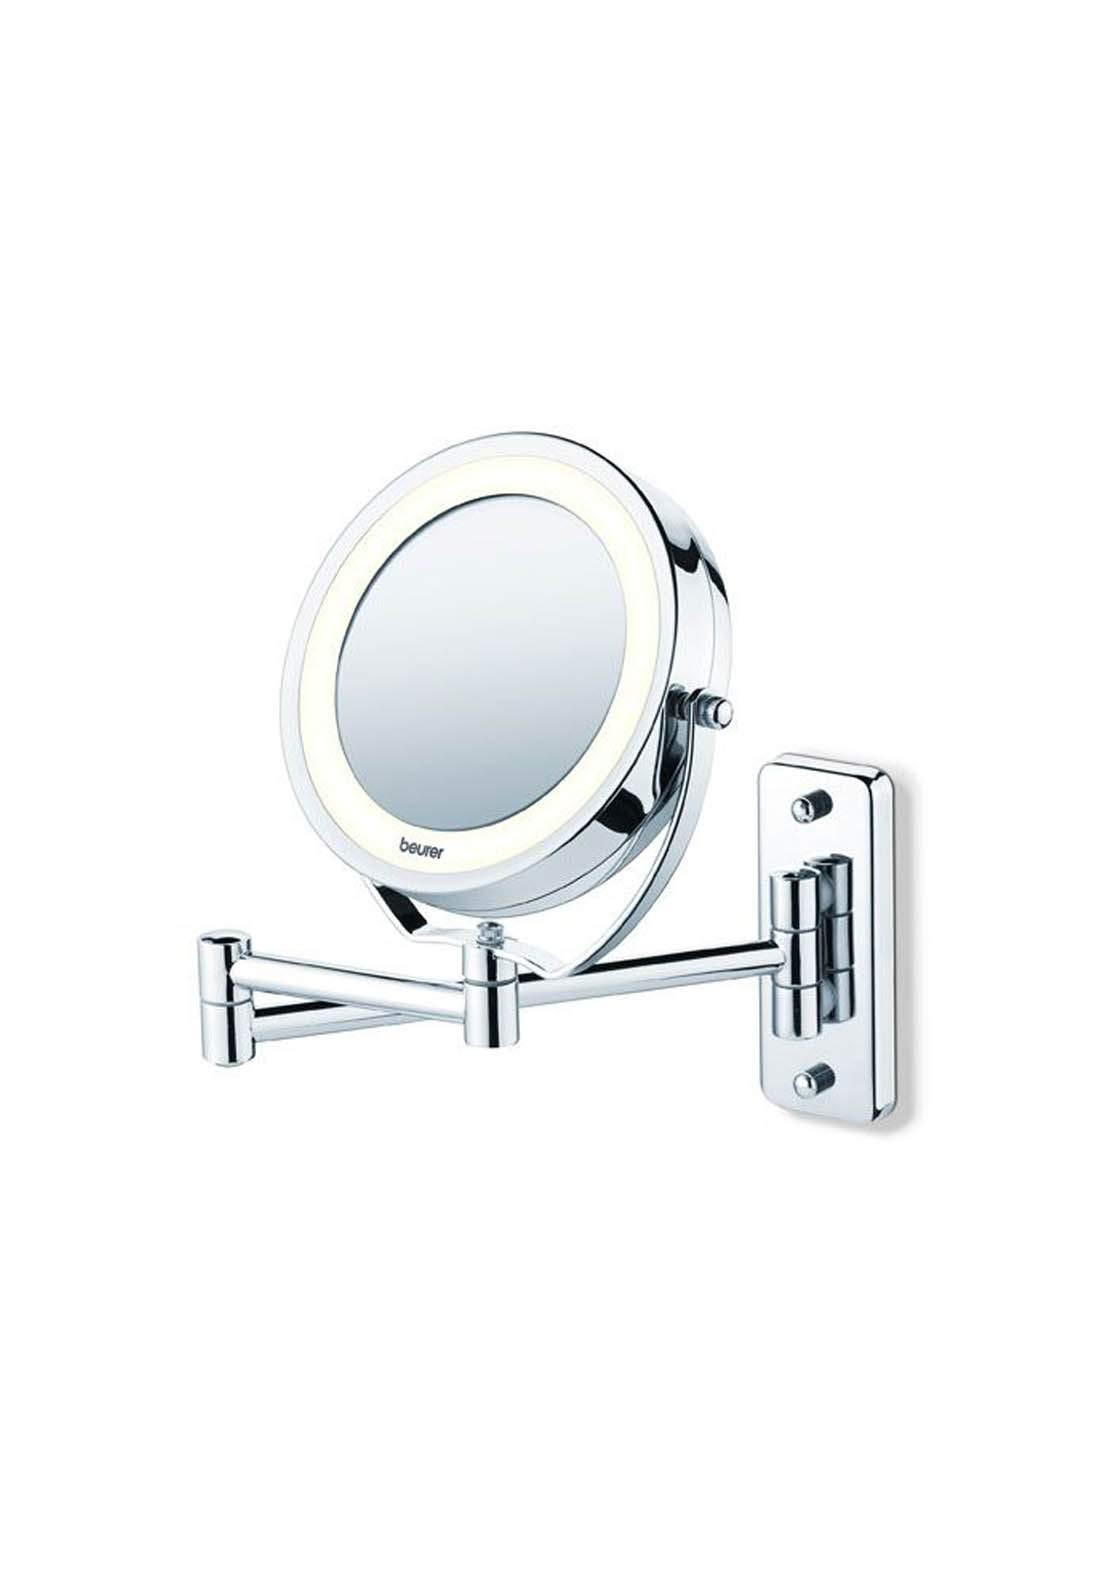 Beurer BS 59 Illuminated Cosmetics Mirror مرآة مضاءة مكبرة